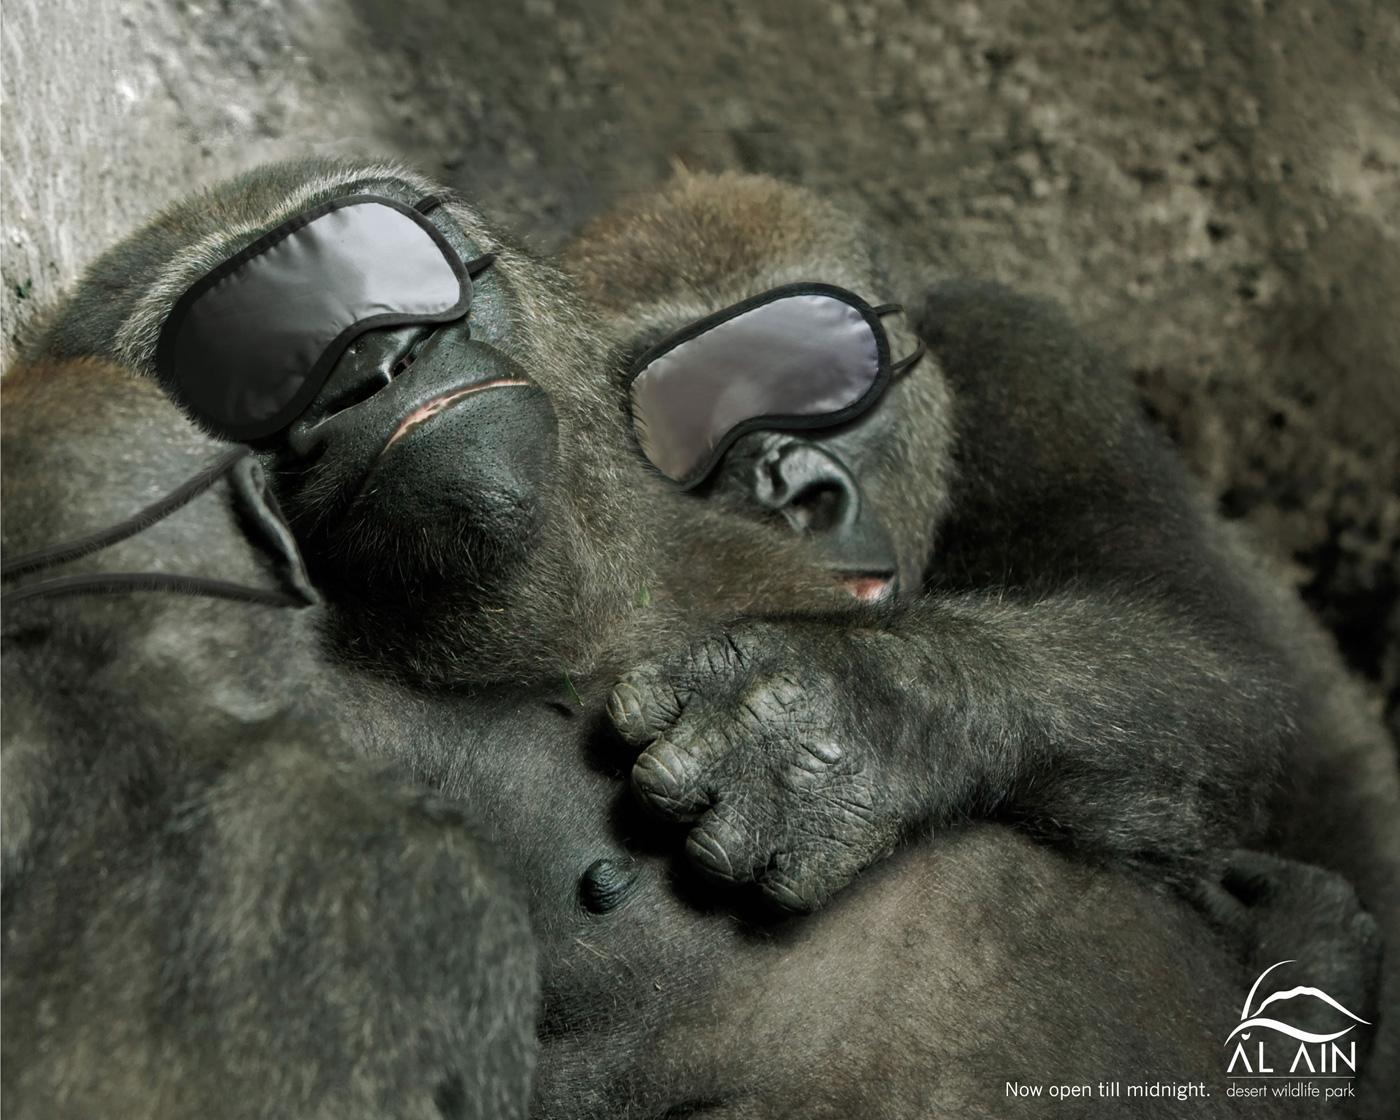 Al Ain Desert Wildlife Park Print Ad -  Gorillas